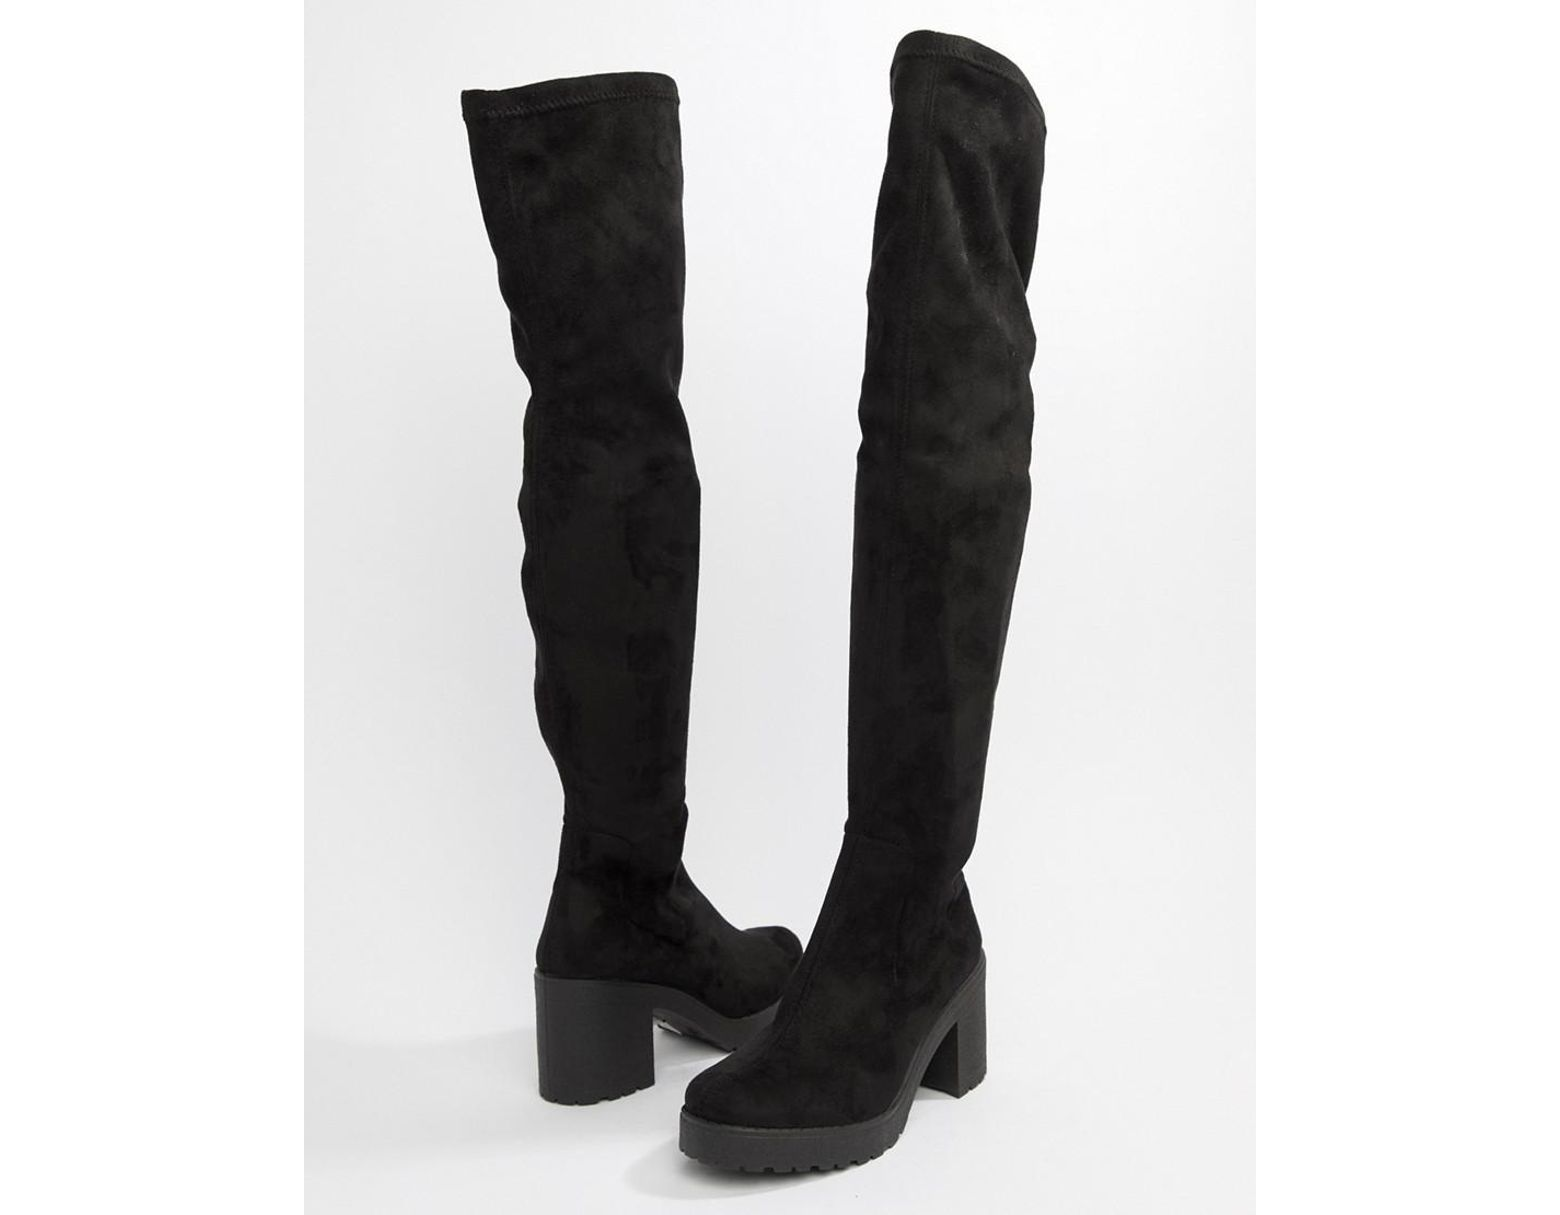 97814d7cdcd Women's Over The Knee Chunky Heel Boots In Black